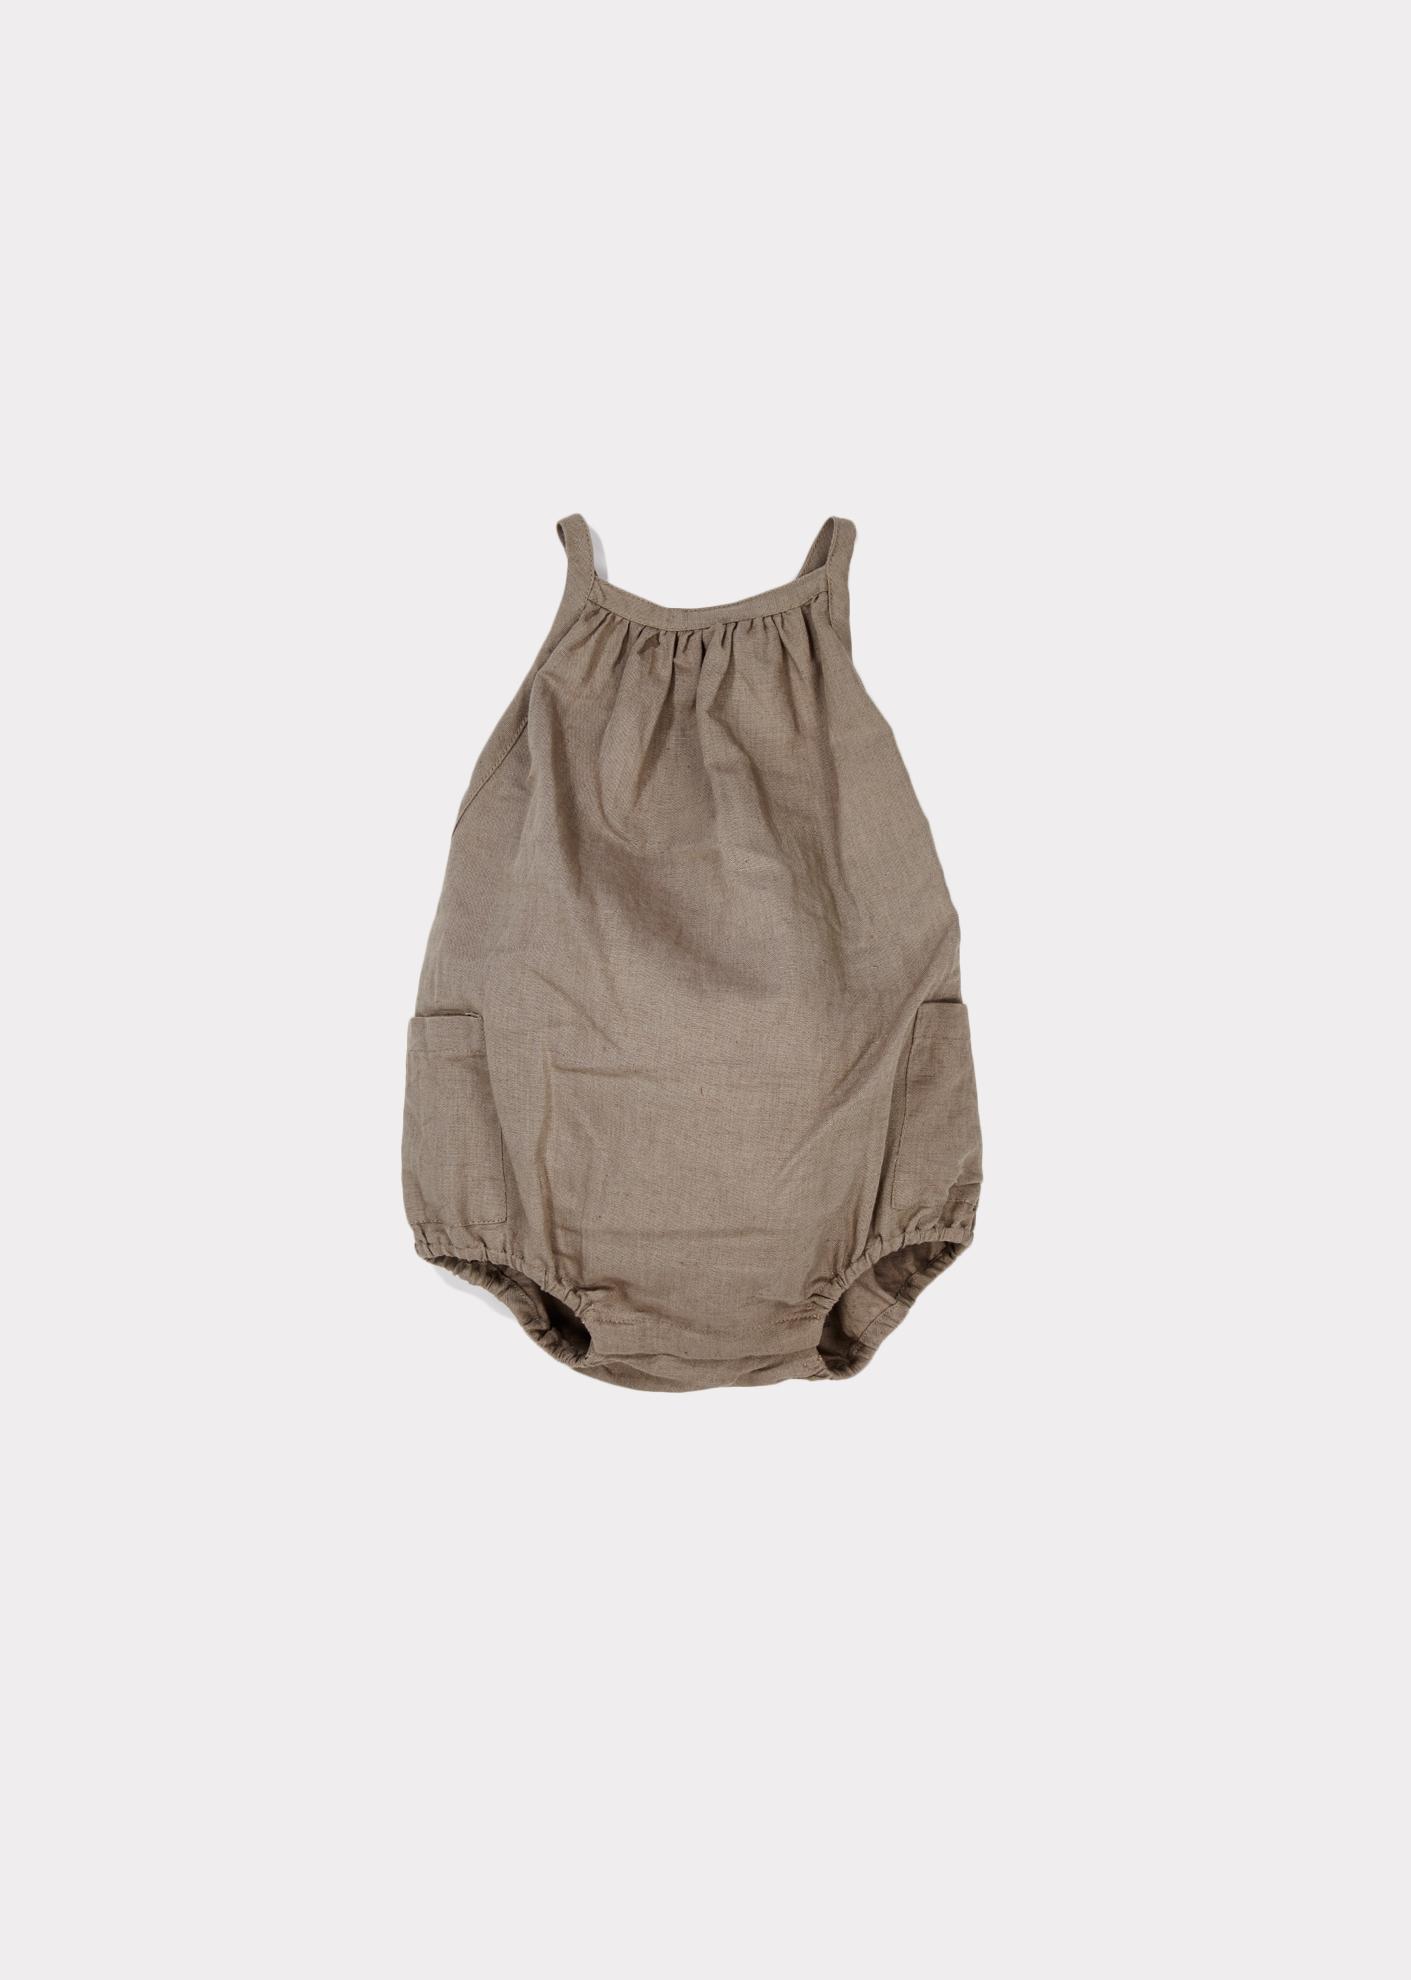 c457a4af8 Azalea Baby Romper, Stone Grey | Baby clothes | Designer baby ...